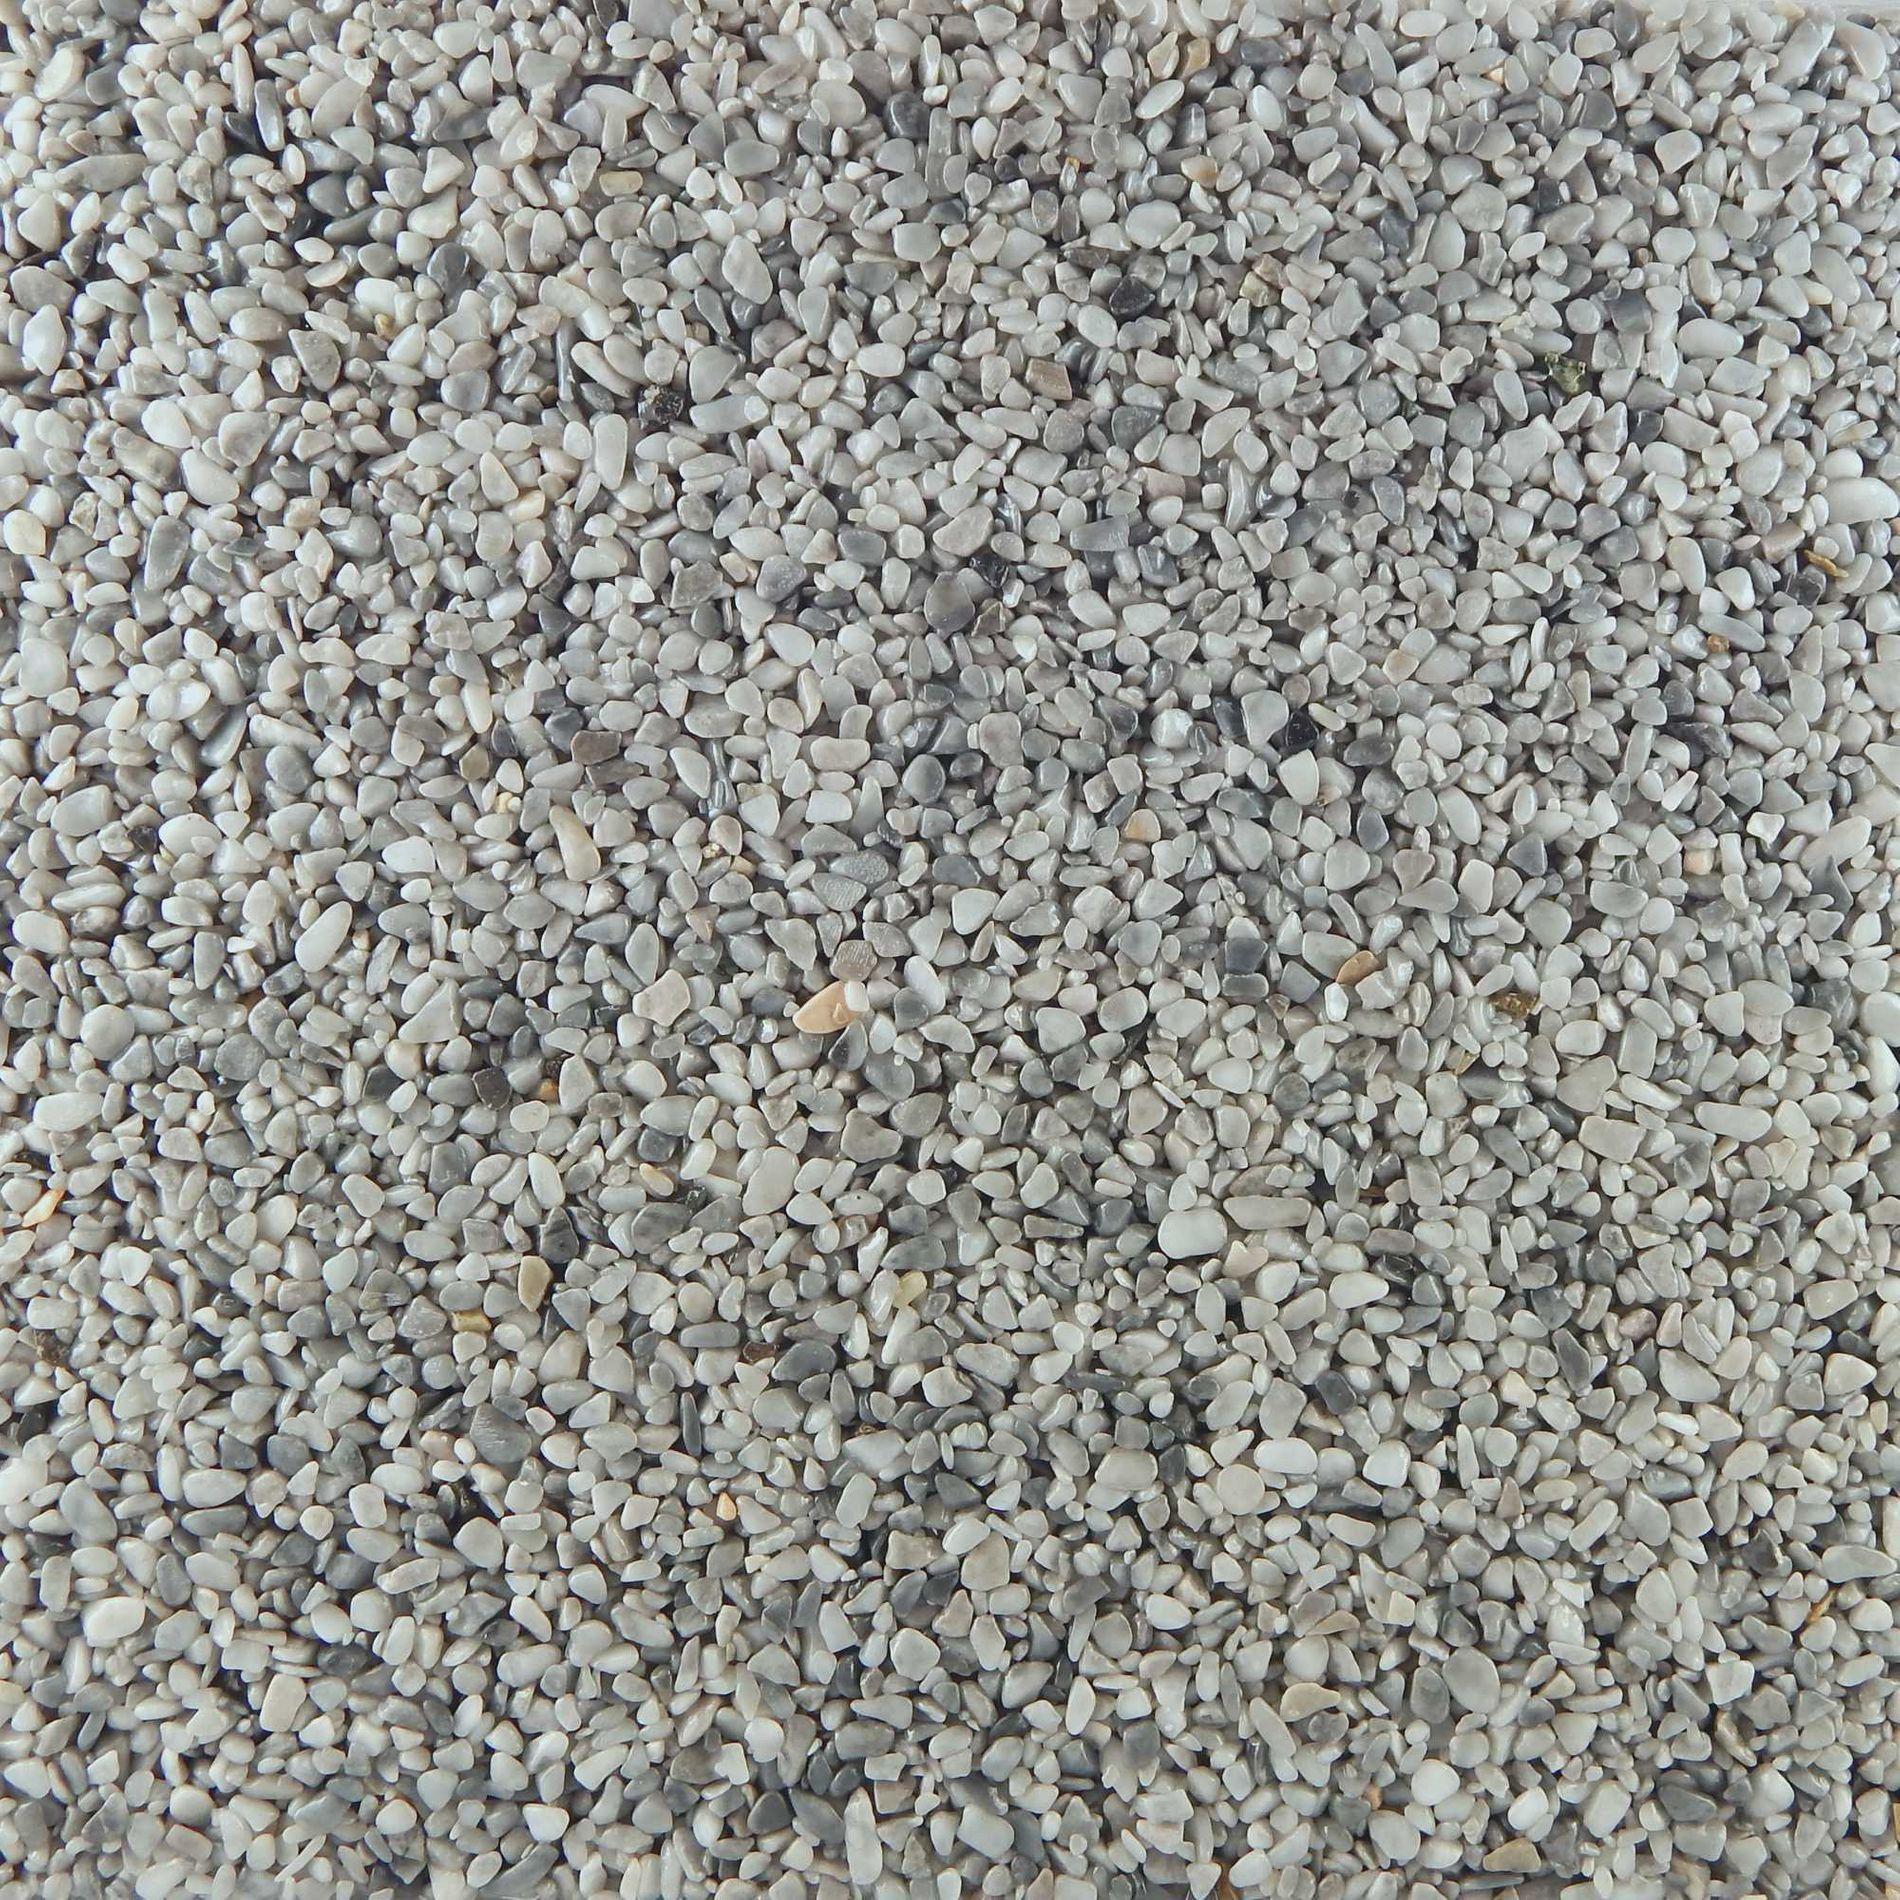 terralith marmor steinteppich nebula f r 1 qm innen. Black Bedroom Furniture Sets. Home Design Ideas